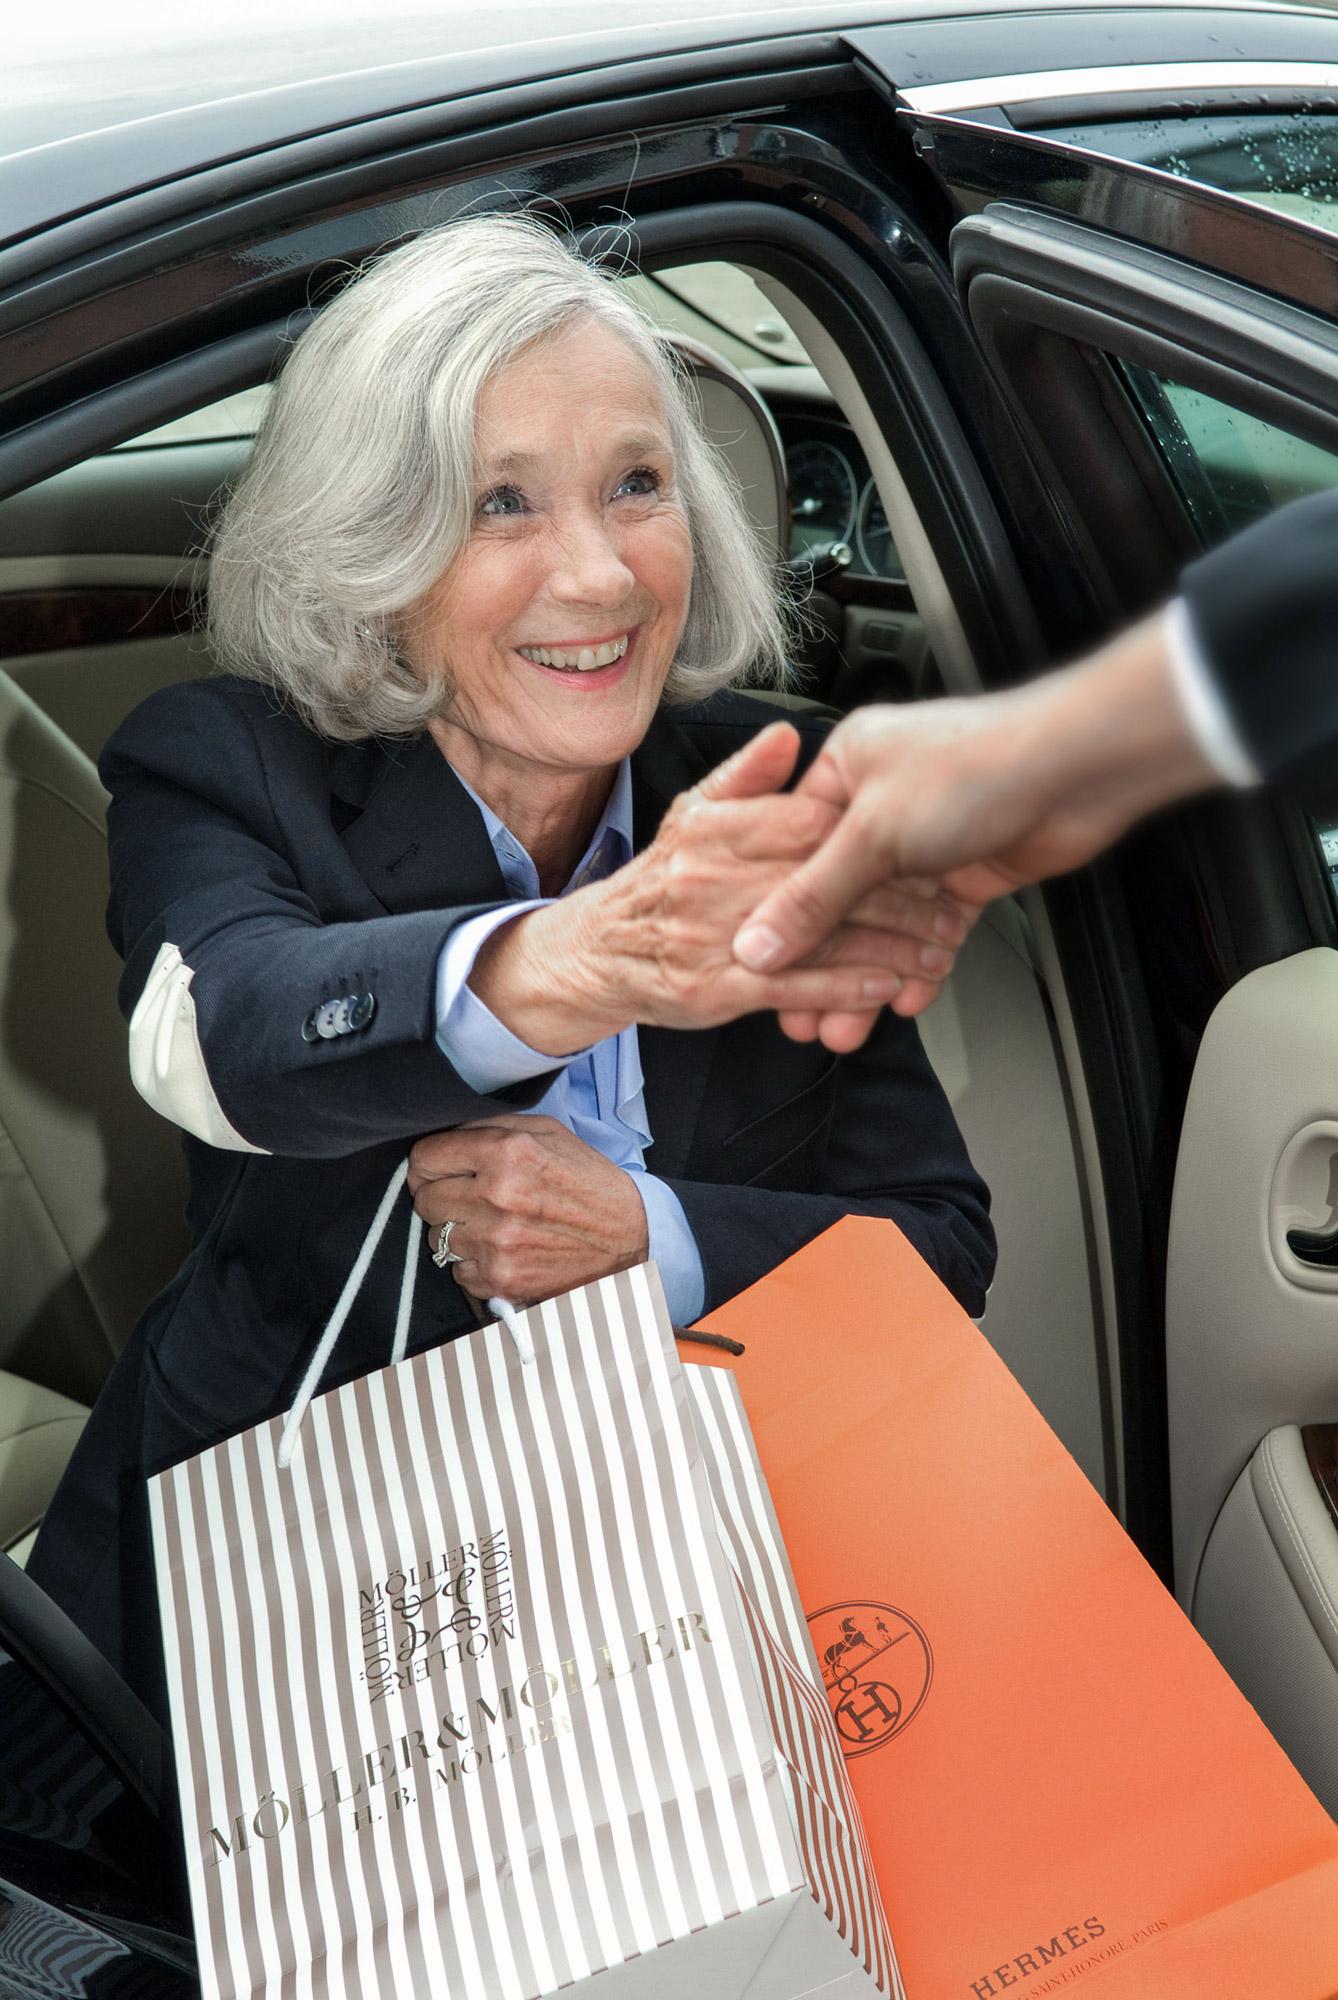 Imagekampagne Seniorenresidenz